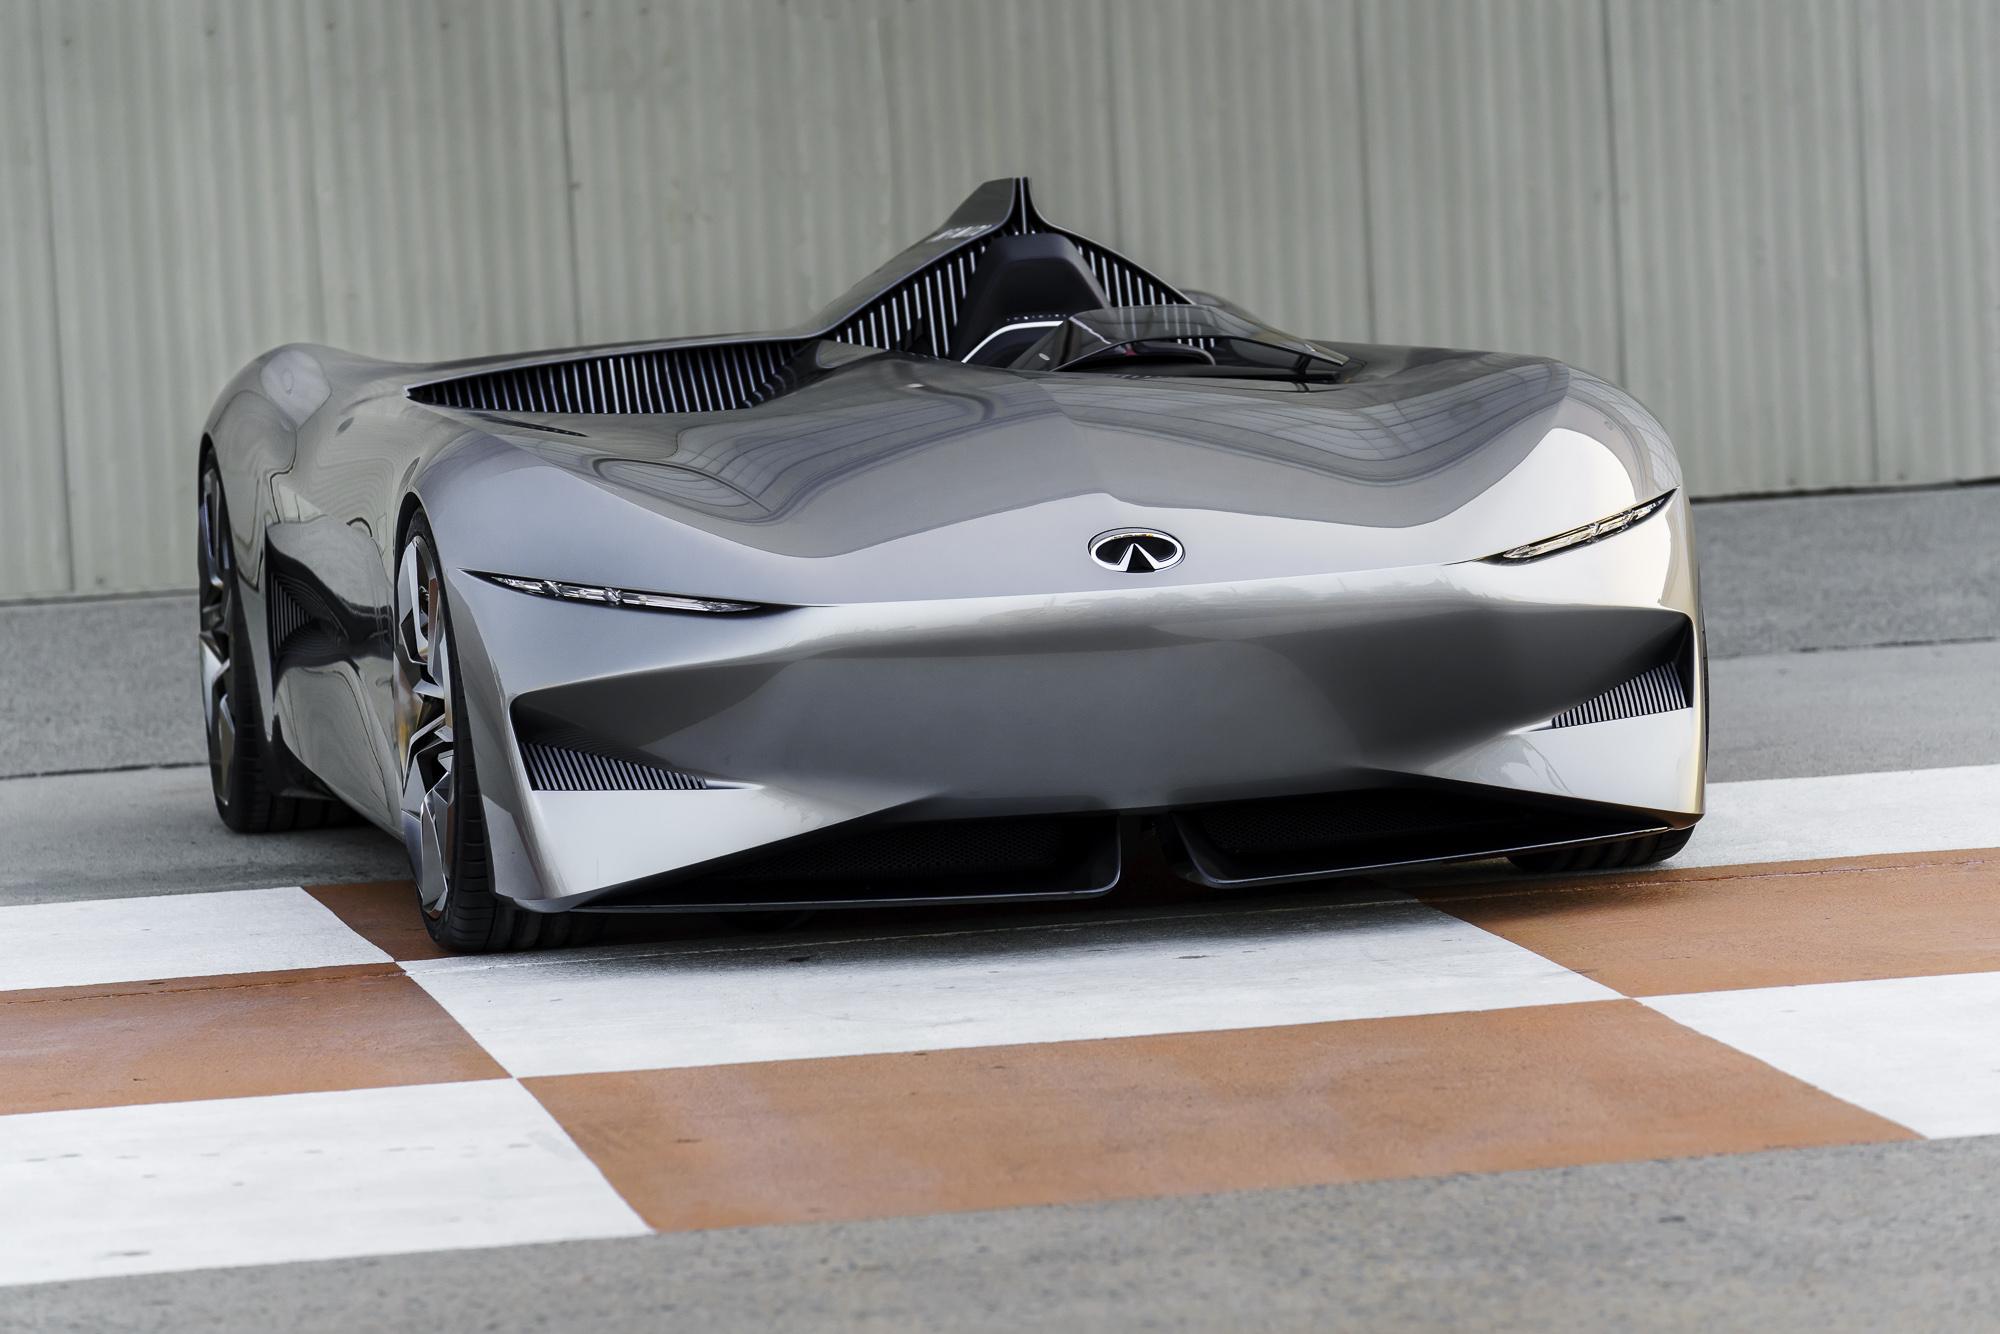 Infiniti Prototype 10 Gives Glimpse Of Future Electric Sports Car